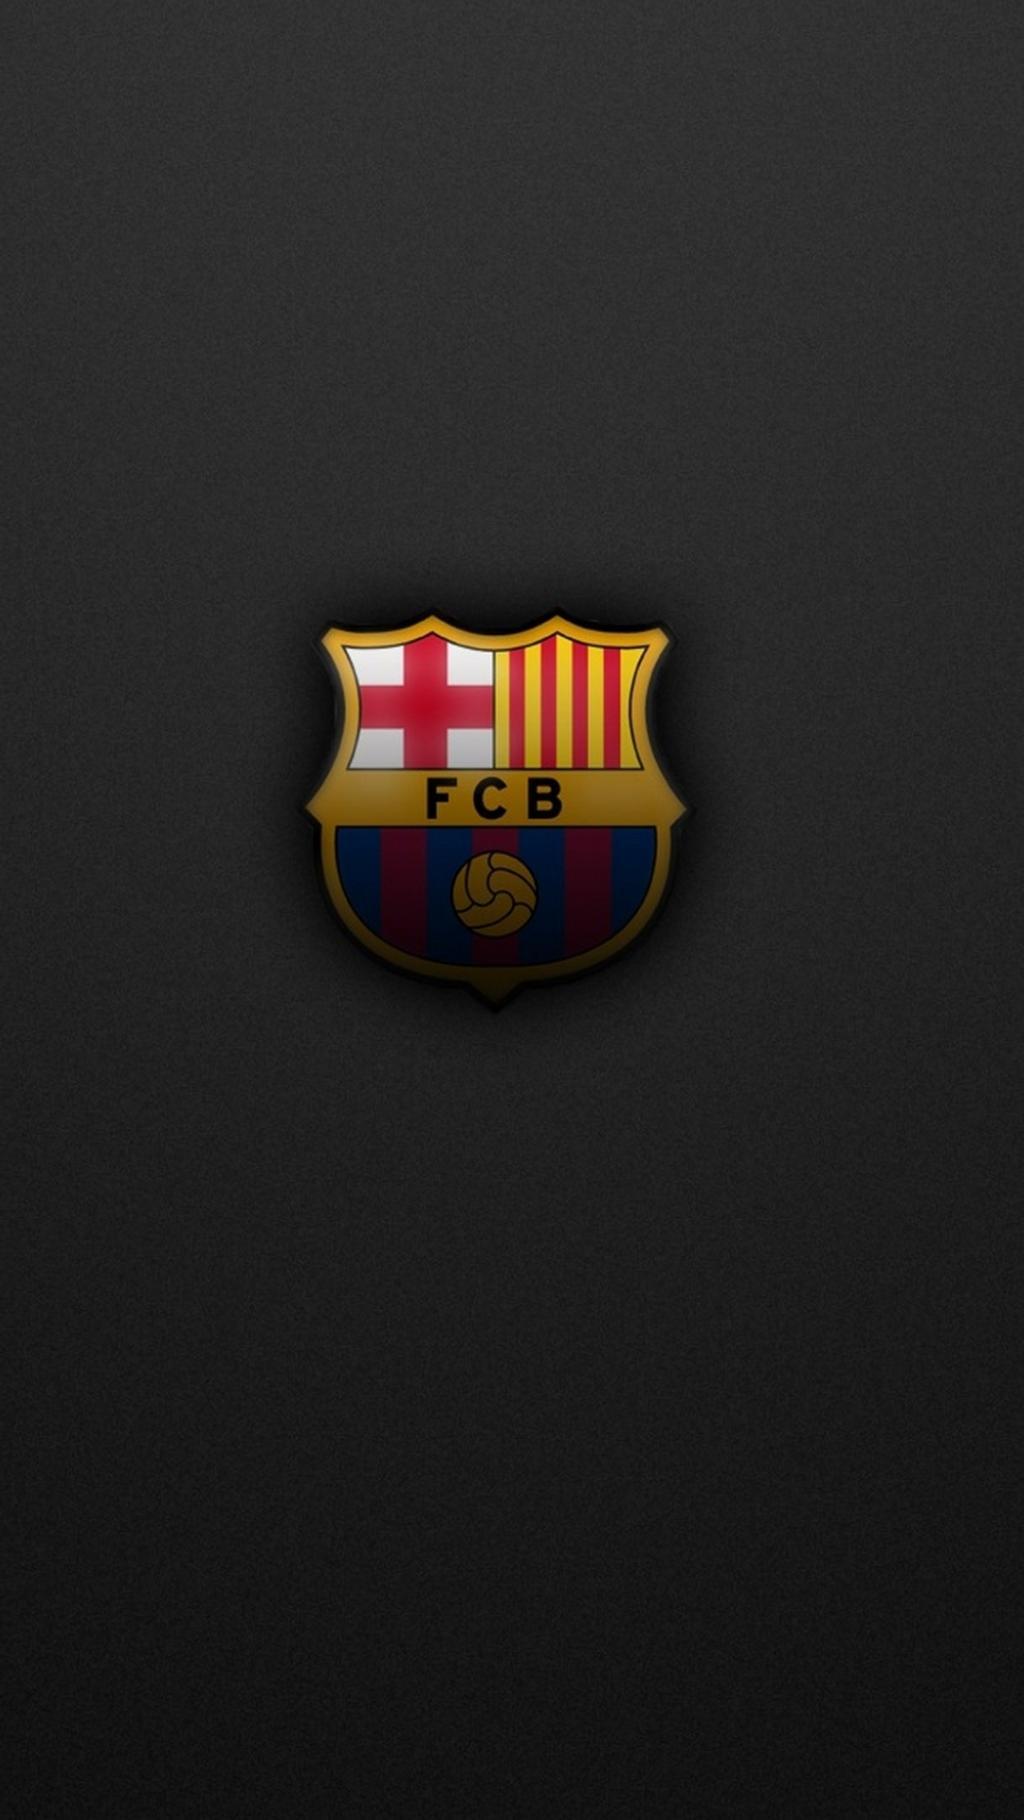 Messi Wallpaper Iphone 6 巴塞罗那标志黑色背景 锁屏图片 高清手机壁纸 体育 回车桌面